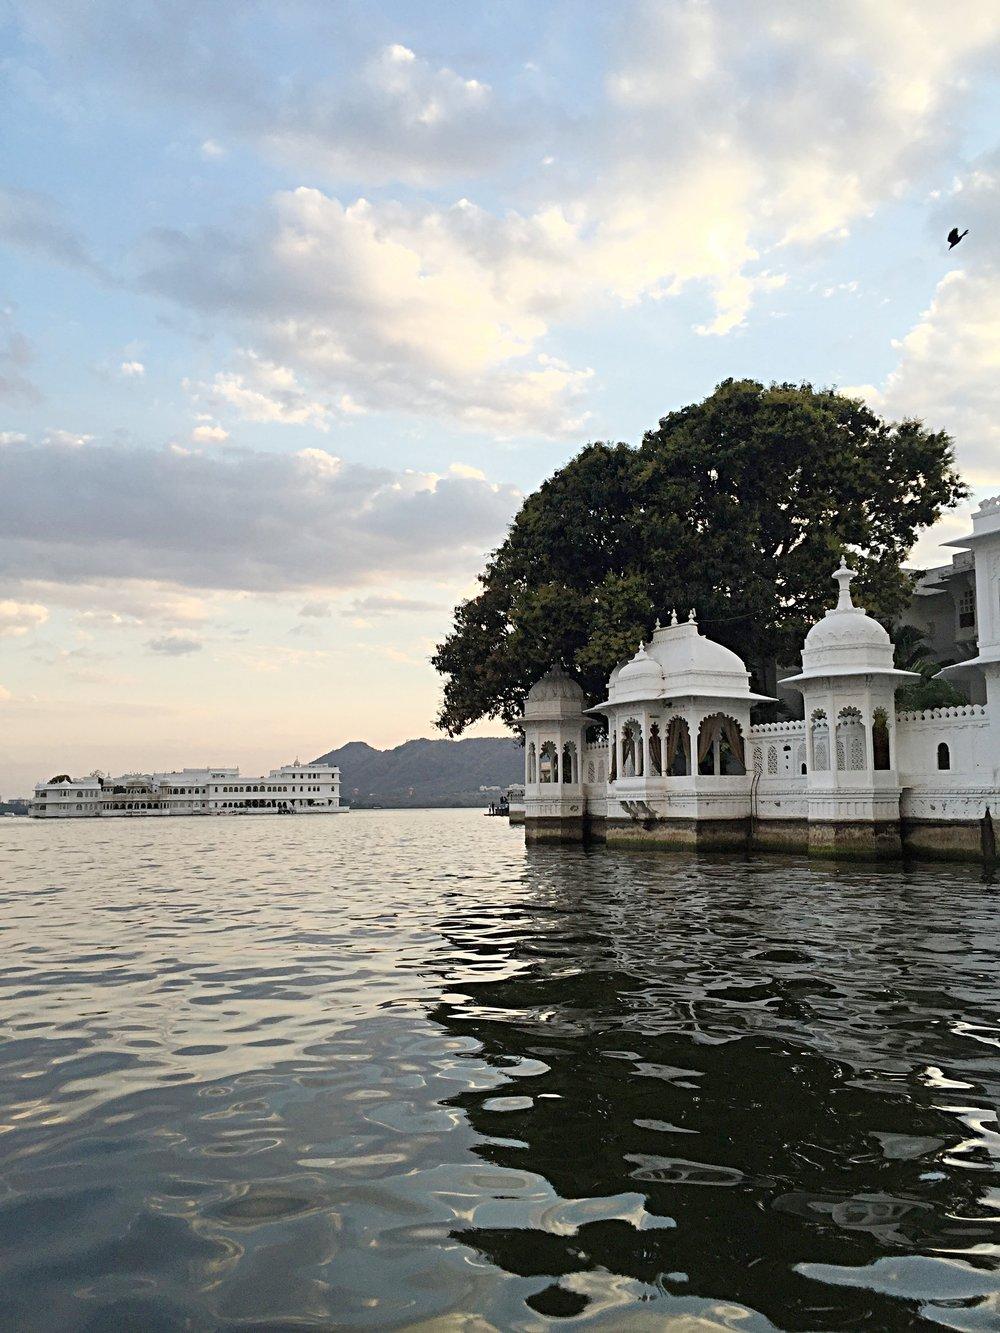 BEAUTIFUL HAVELIS LINE THE BANKS OF LAKE PICHOLA